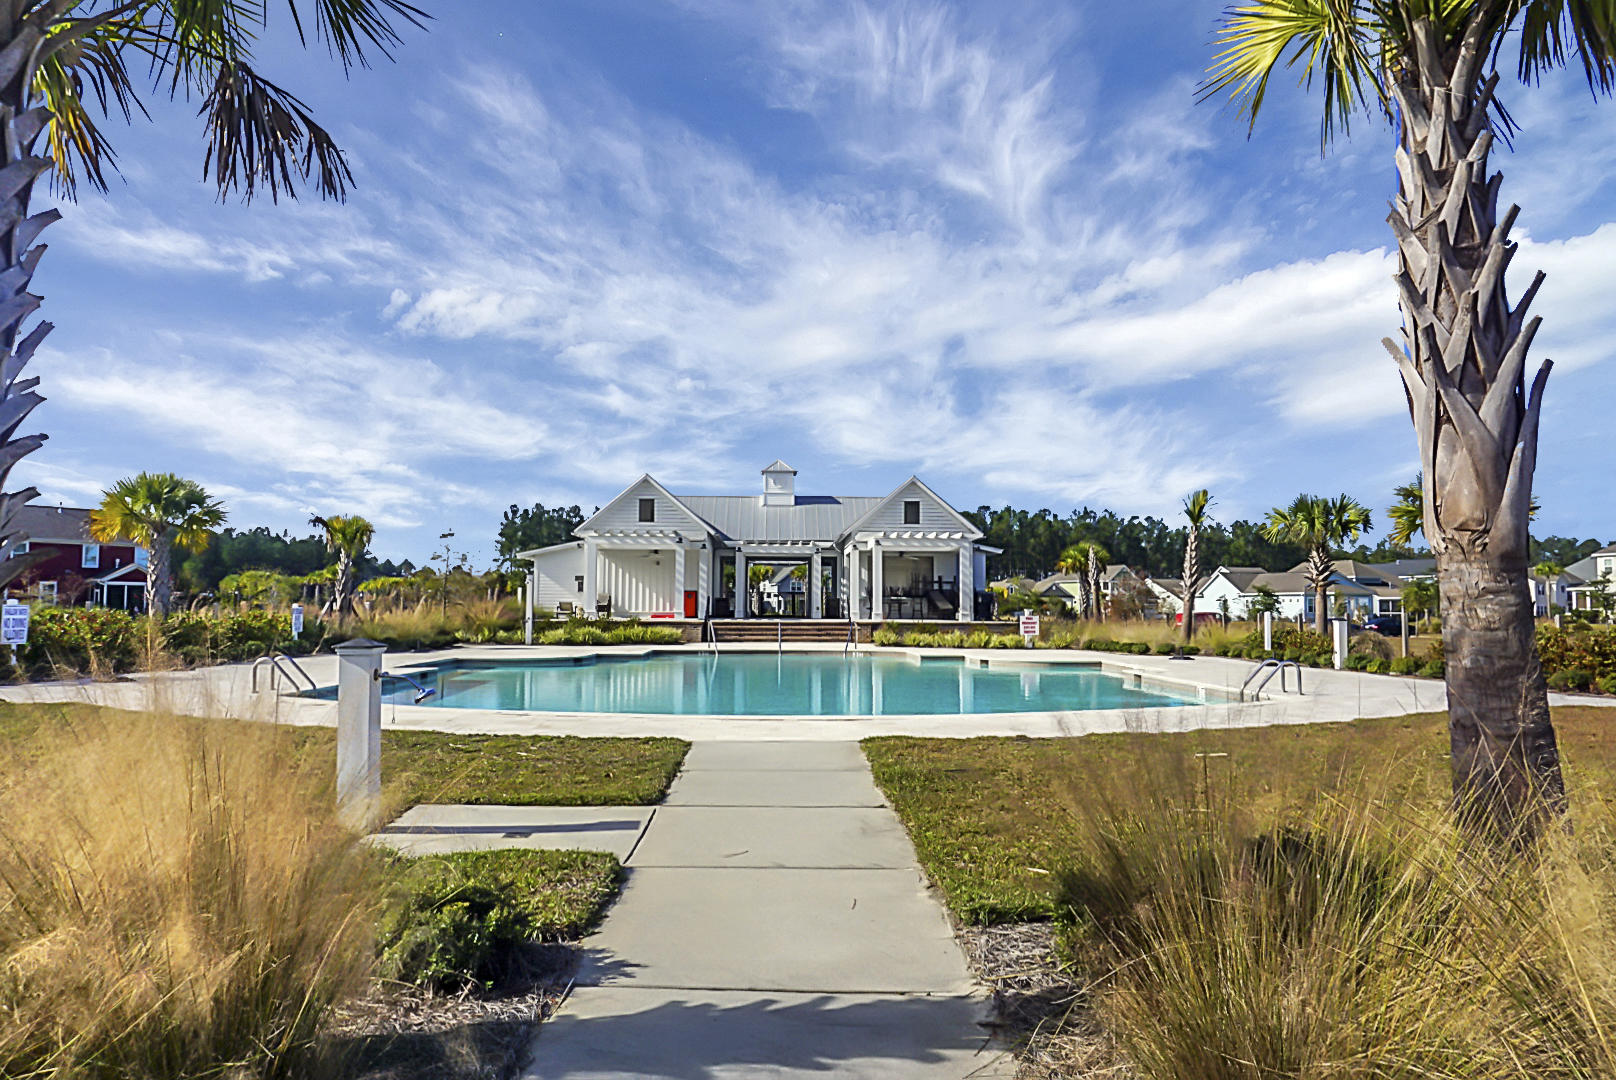 Cane Bay Plantation Homes For Sale - 284 Calm Water, Summerville, SC - 21